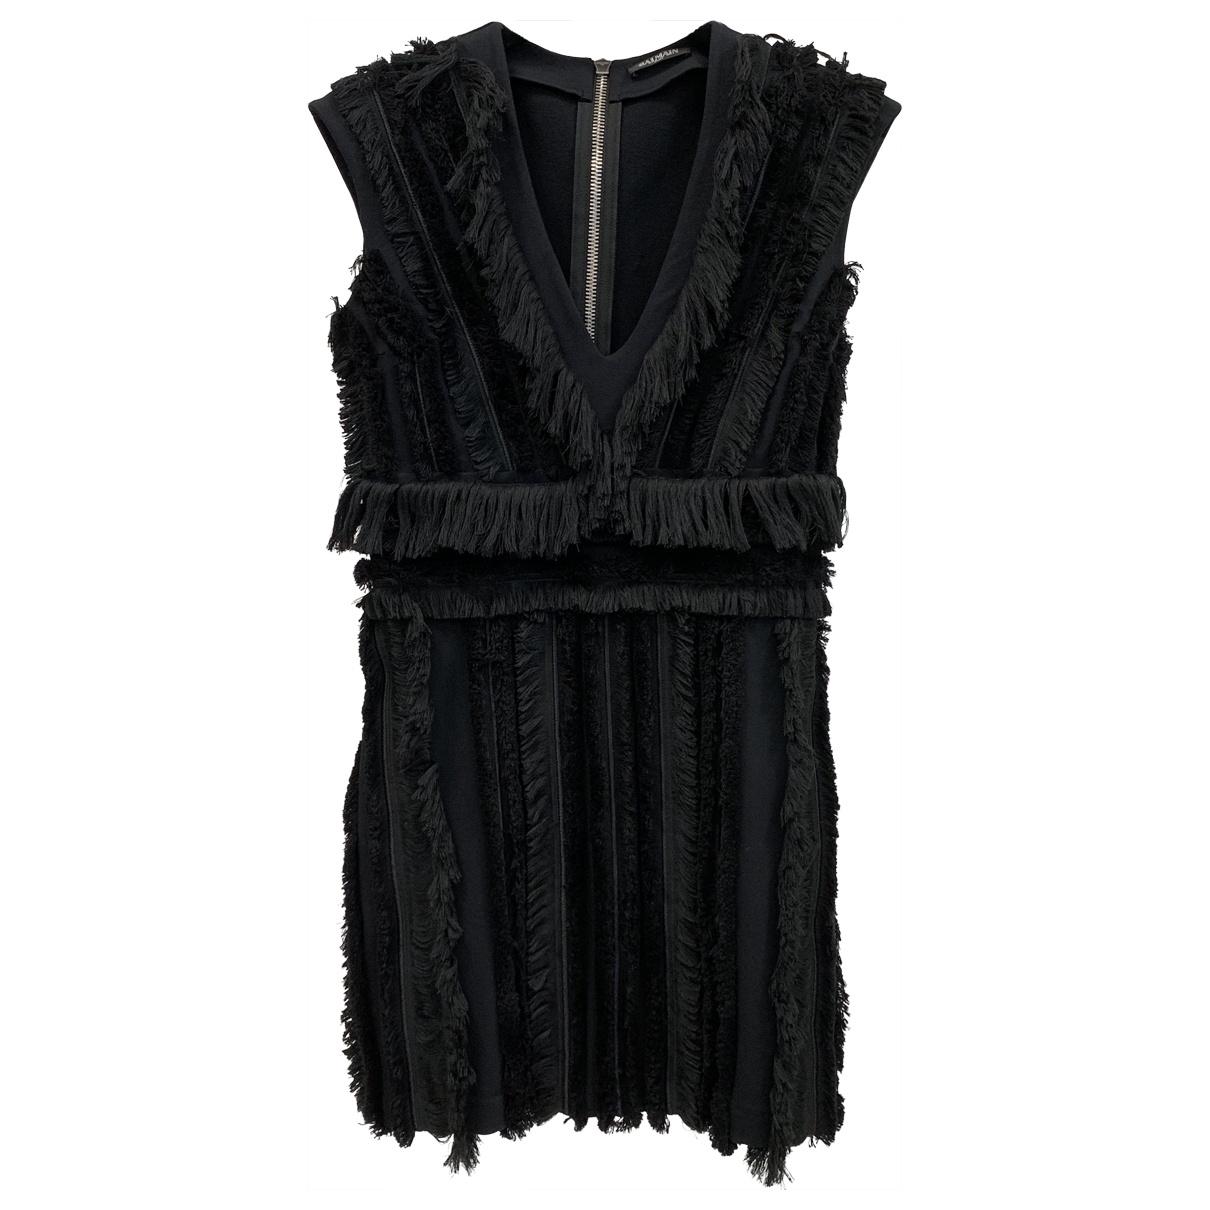 Balmain \N Black Cotton - elasthane dress for Women 40 FR